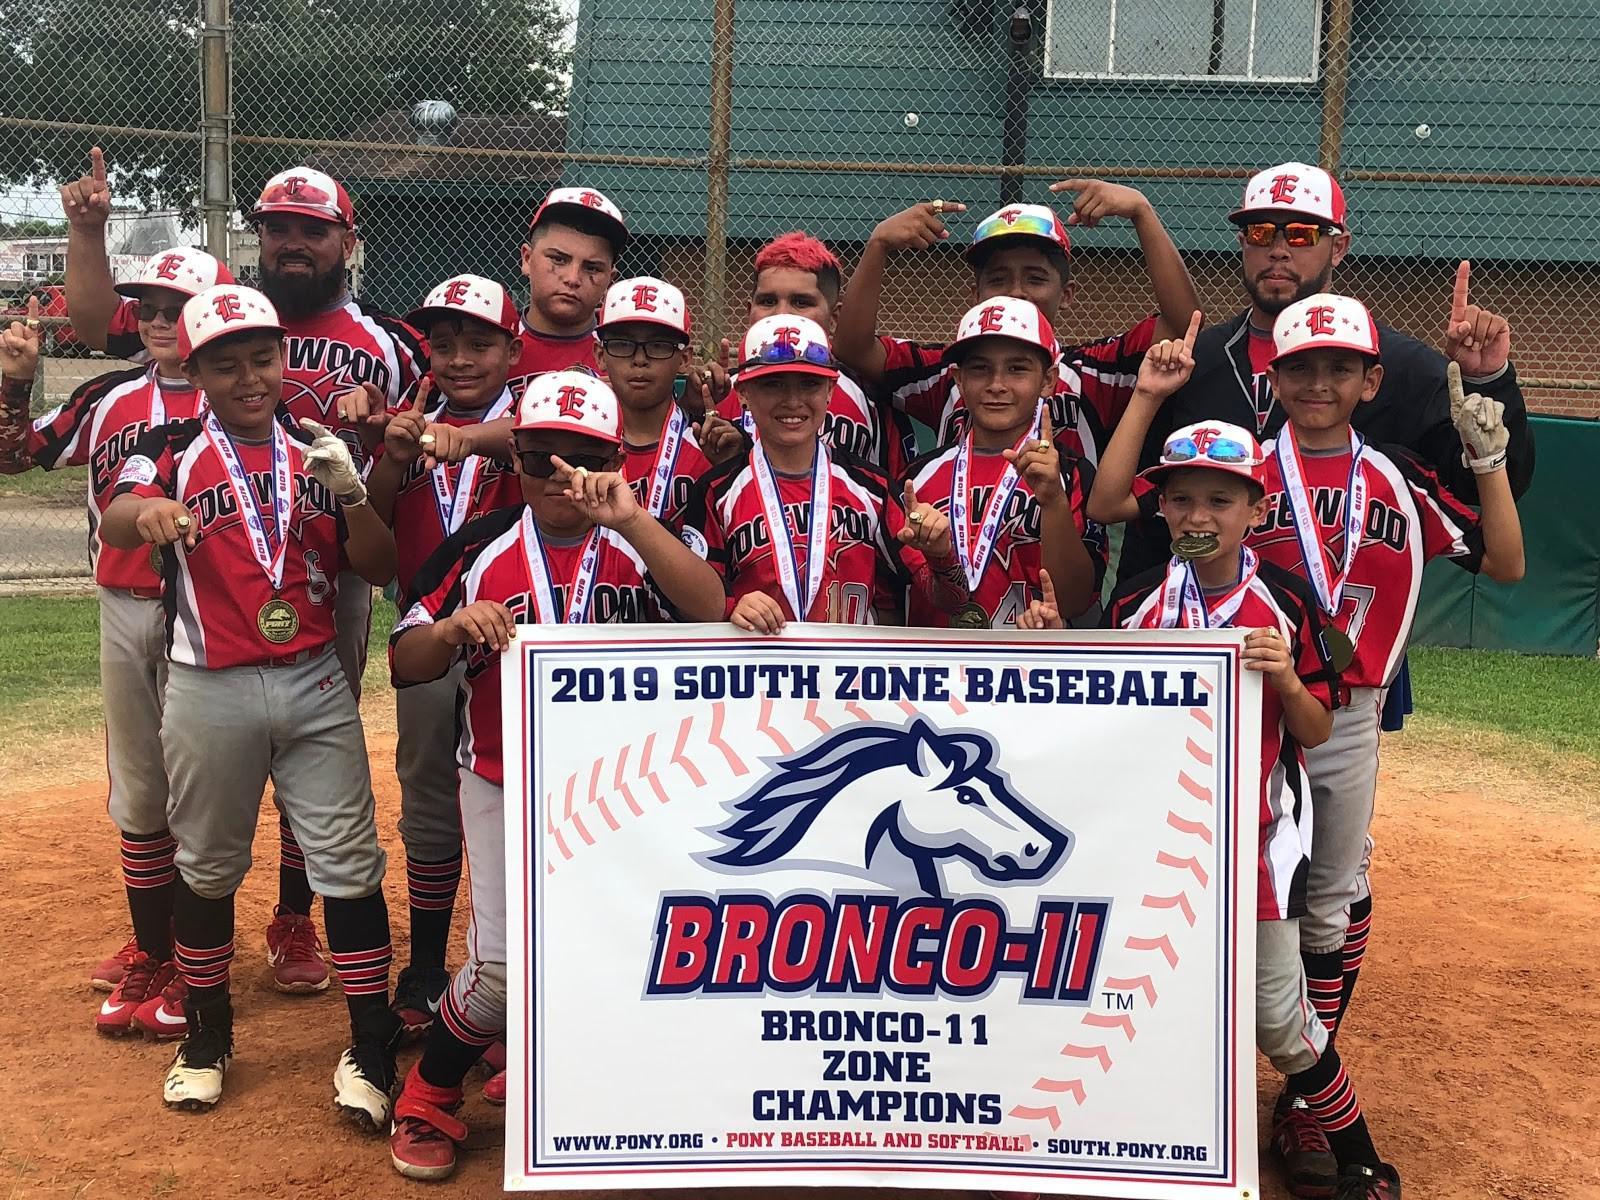 Edgewood advances to PONY League's Bronco-11 World Series